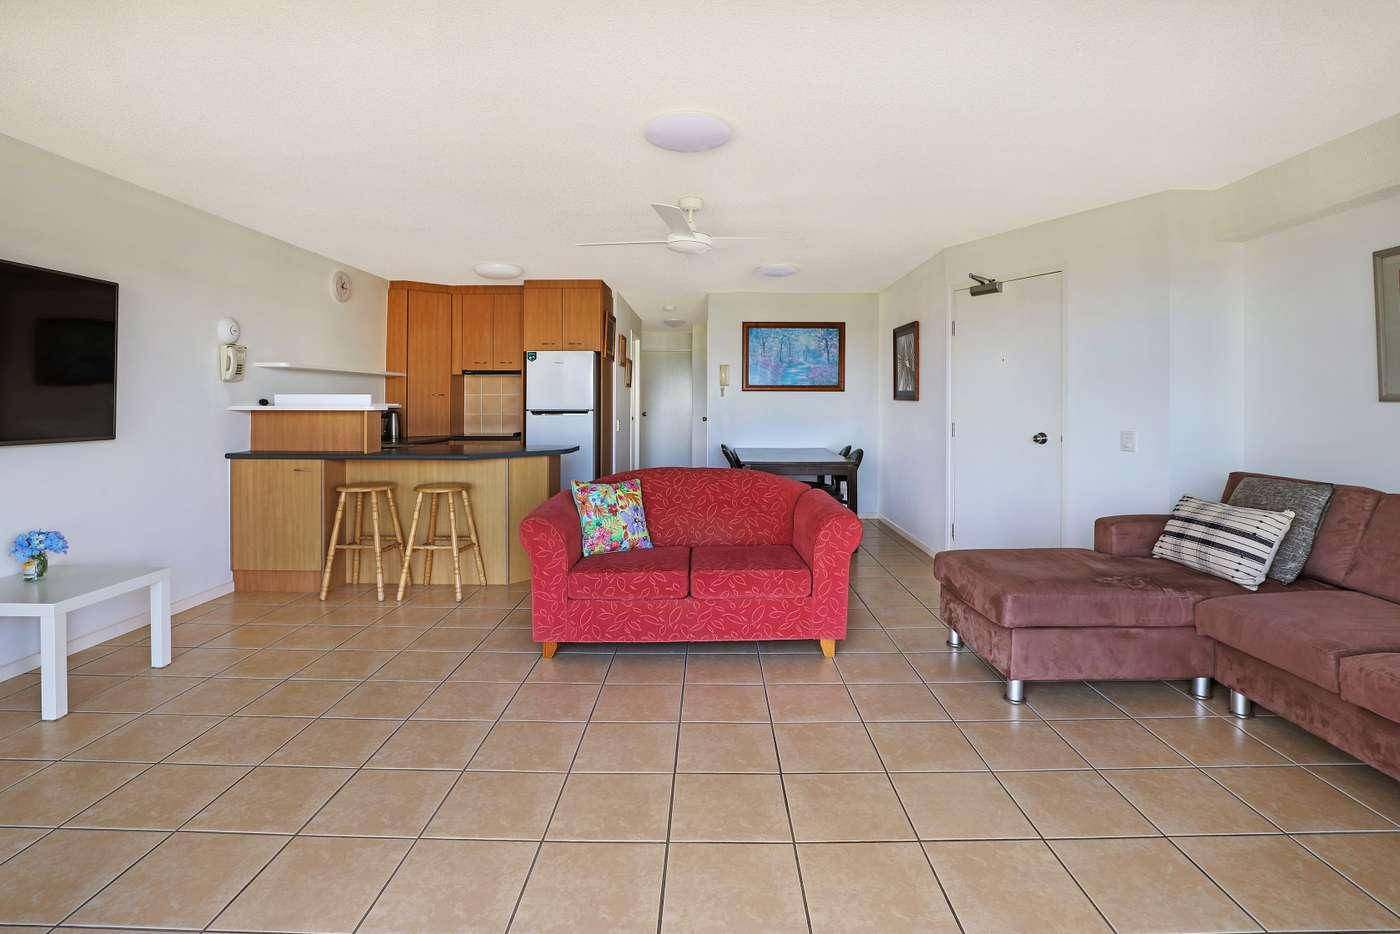 Sixth view of Homely apartment listing, 15/18 Mahia Terrace, Kings Beach QLD 4551